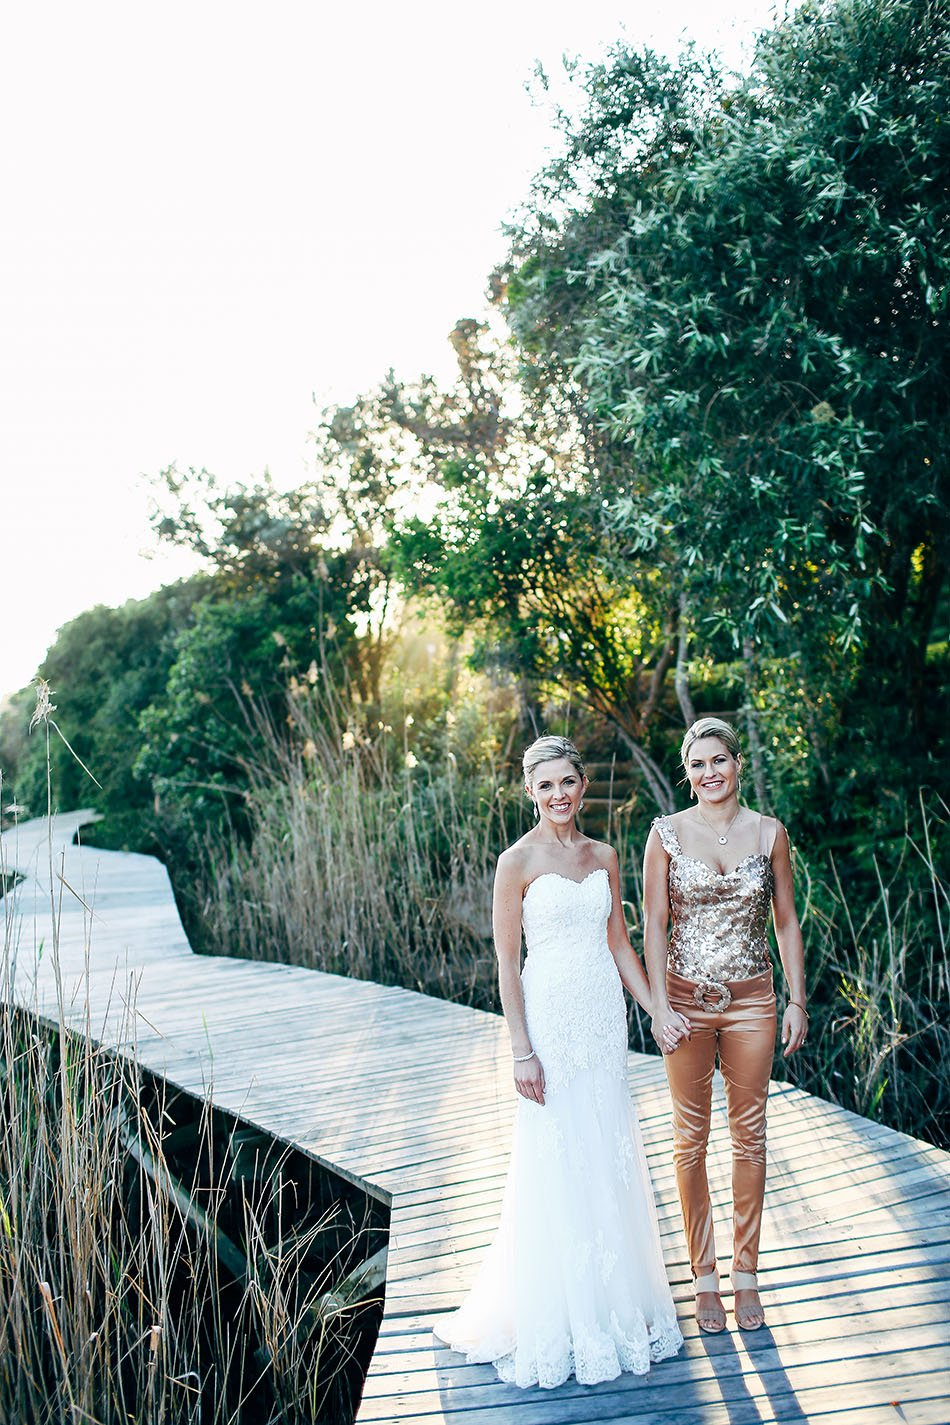 Michelle&Karien -- Married@The Views Botique Hotel&Spa, Wilderness-1557